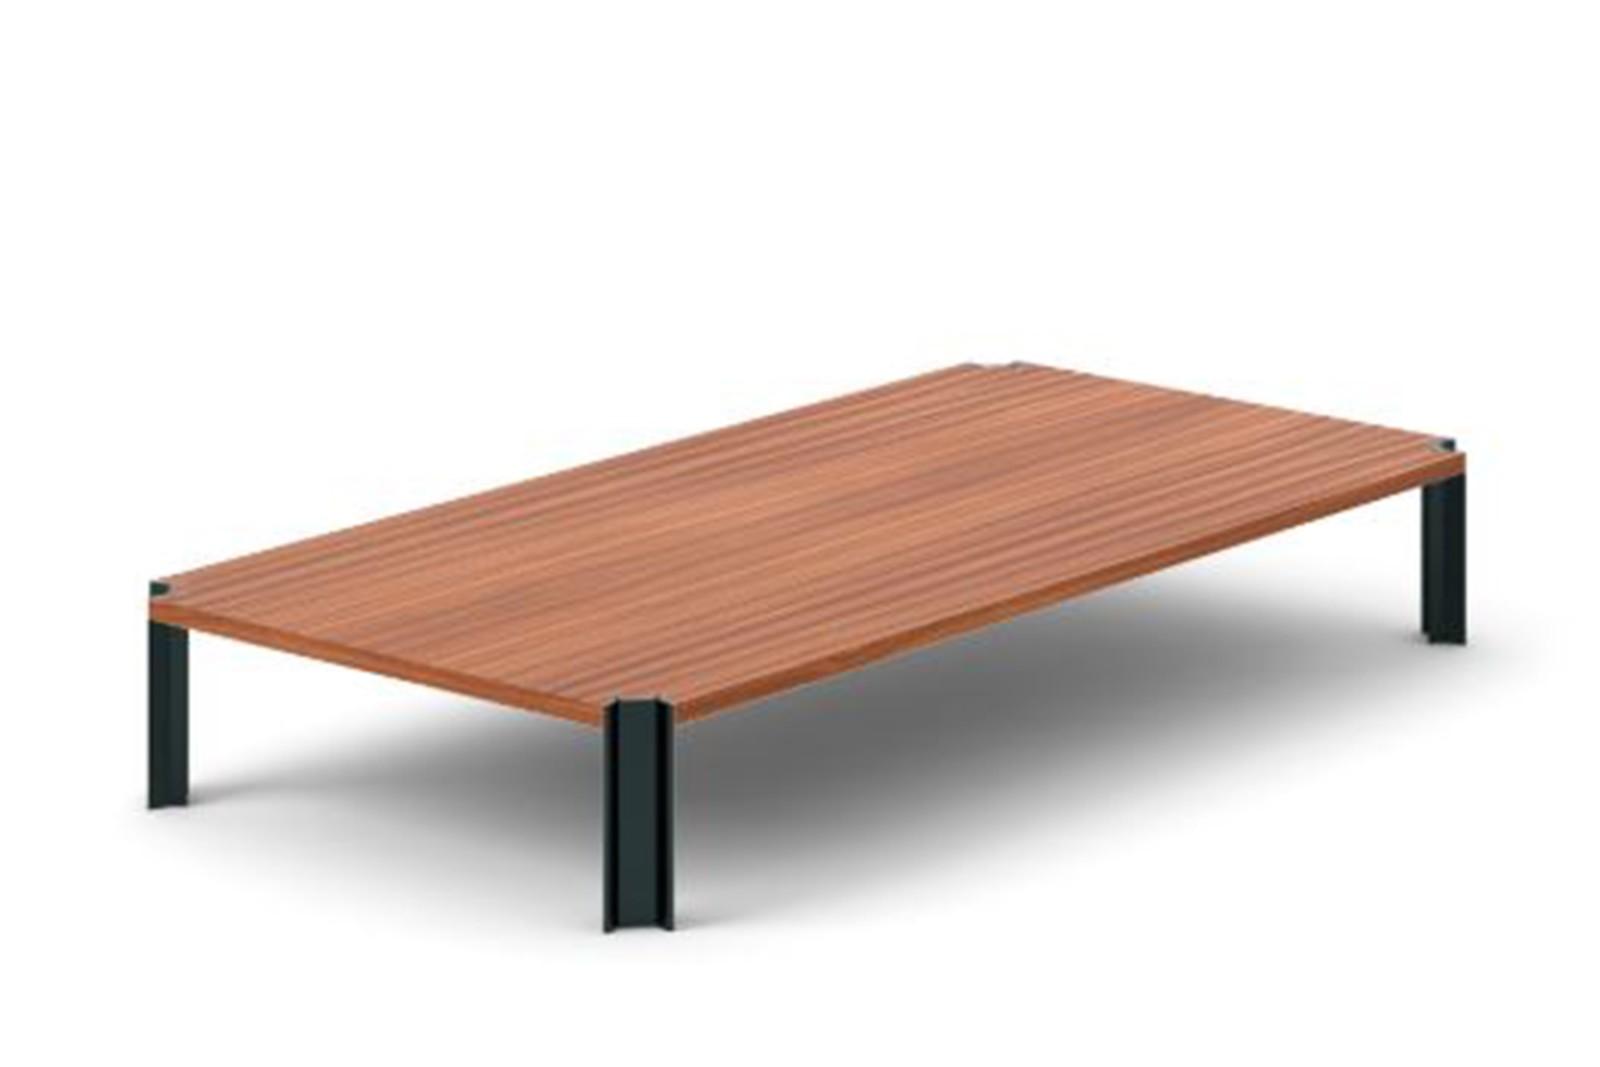 Crossing Coffee Table, Rectangular Super-matt Walnut, Black Anodised Aluminium, 200cm